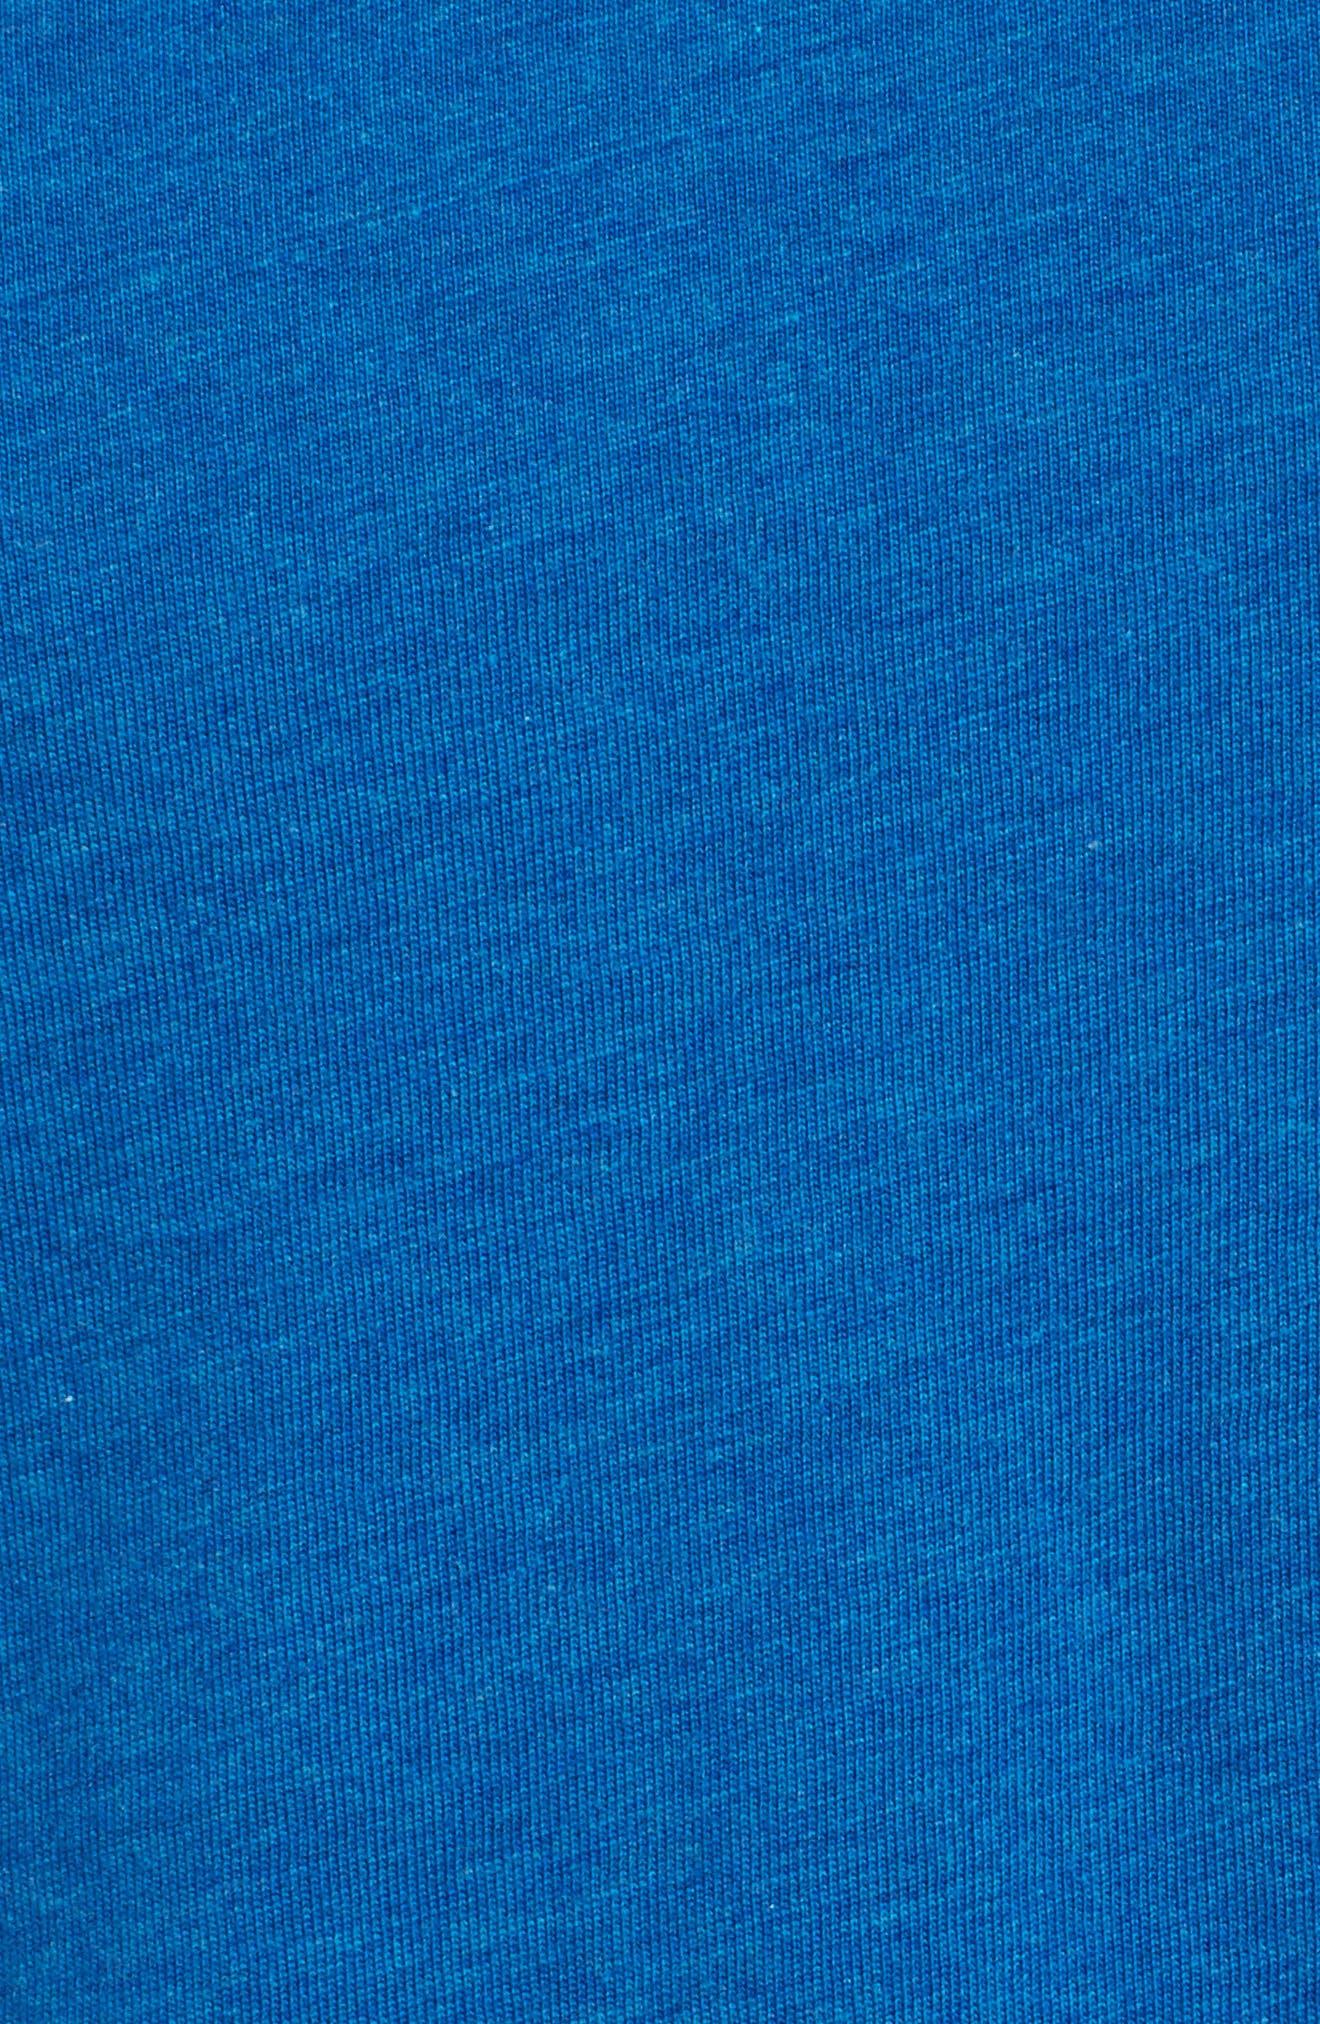 Long Sleeve T-Shirt,                             Alternate thumbnail 16, color,